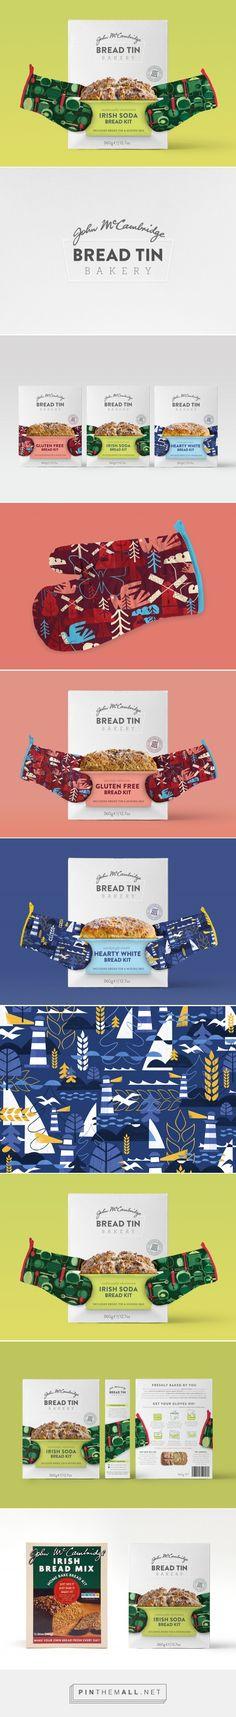 Before & After - Bread Tin Bakery packaging design by Brandpoint - http://www.packagingoftheworld.com/2017/07/john-mccambridges-bread-tin-bakery.html